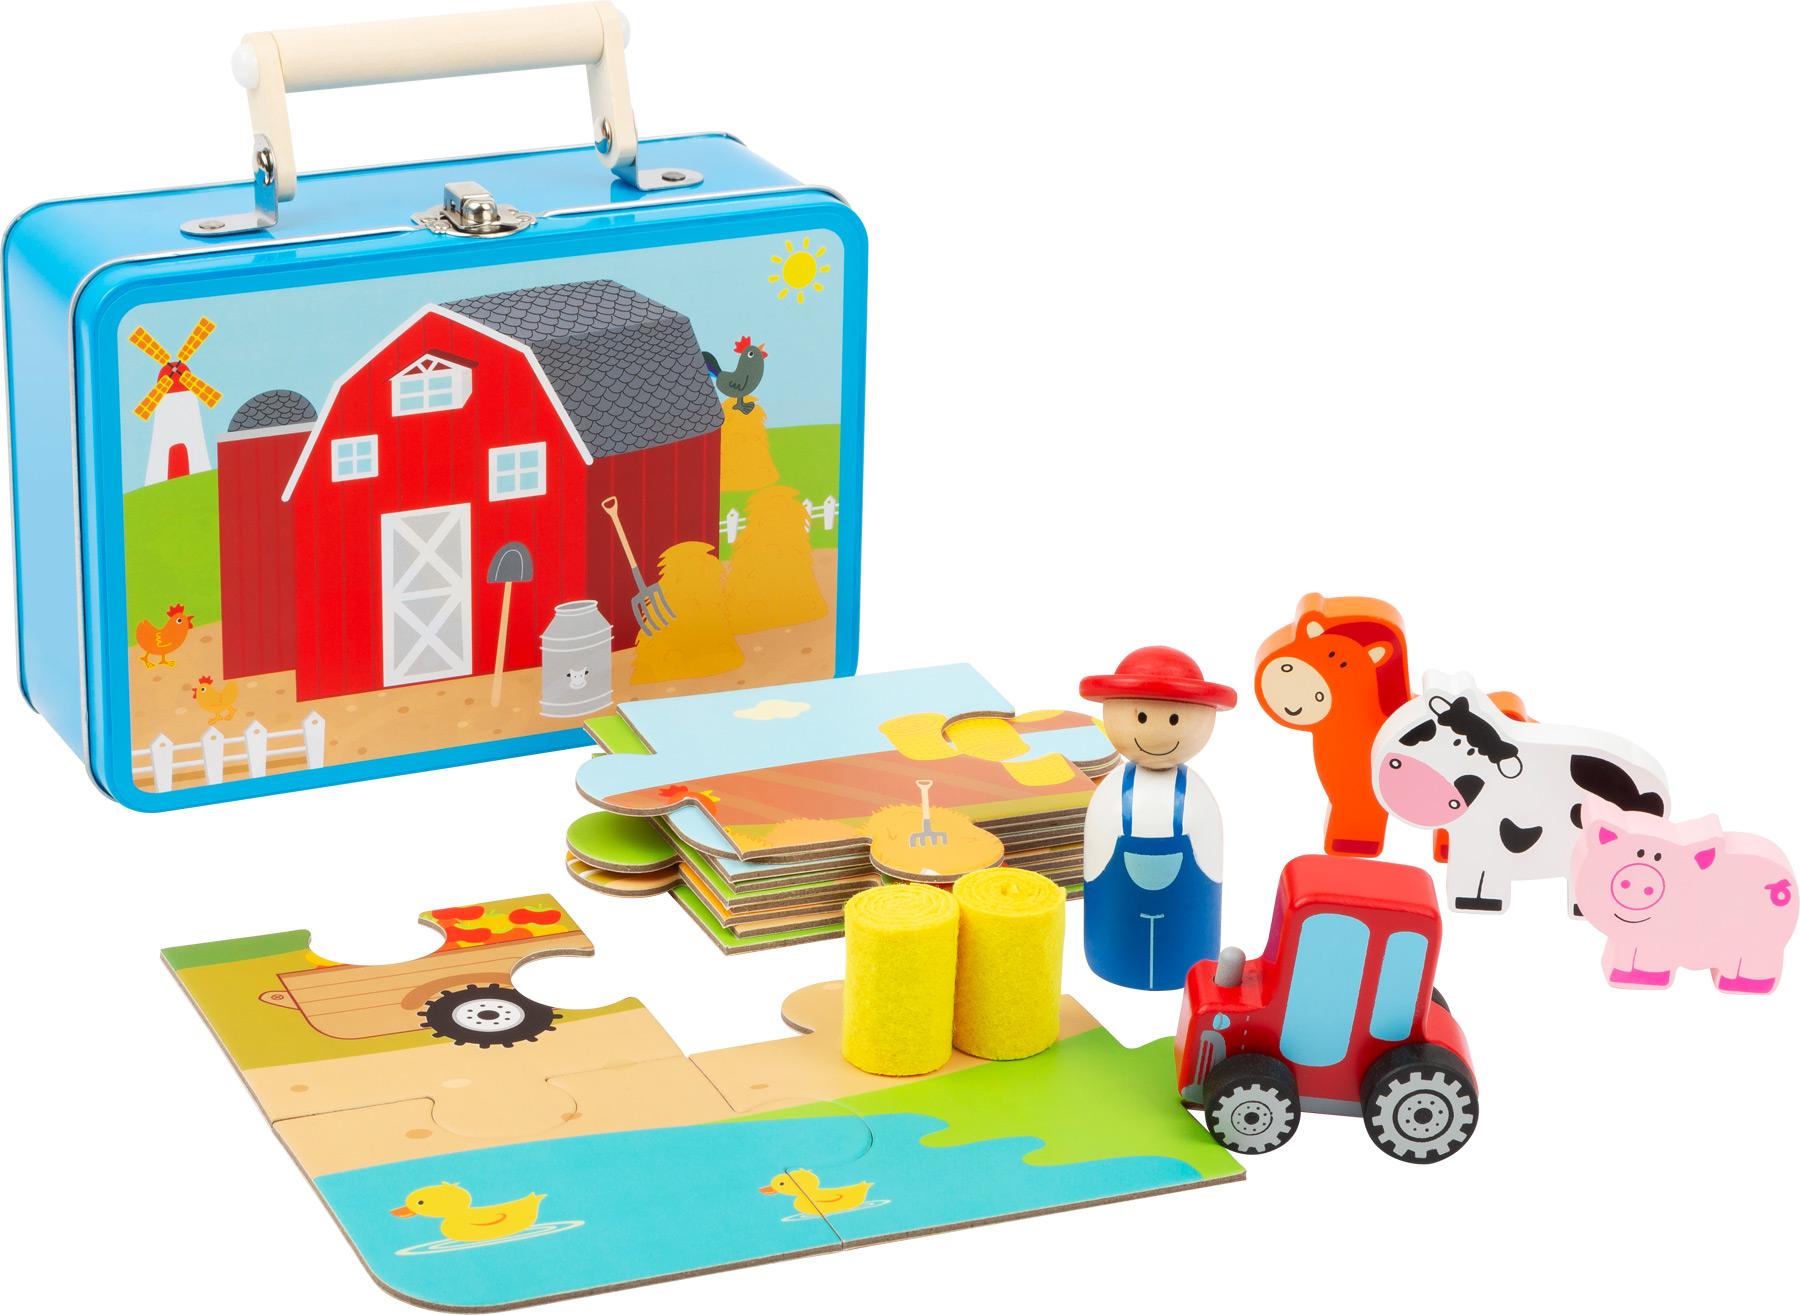 Small Foot Dřevěné puzzle s postavičkami Farma